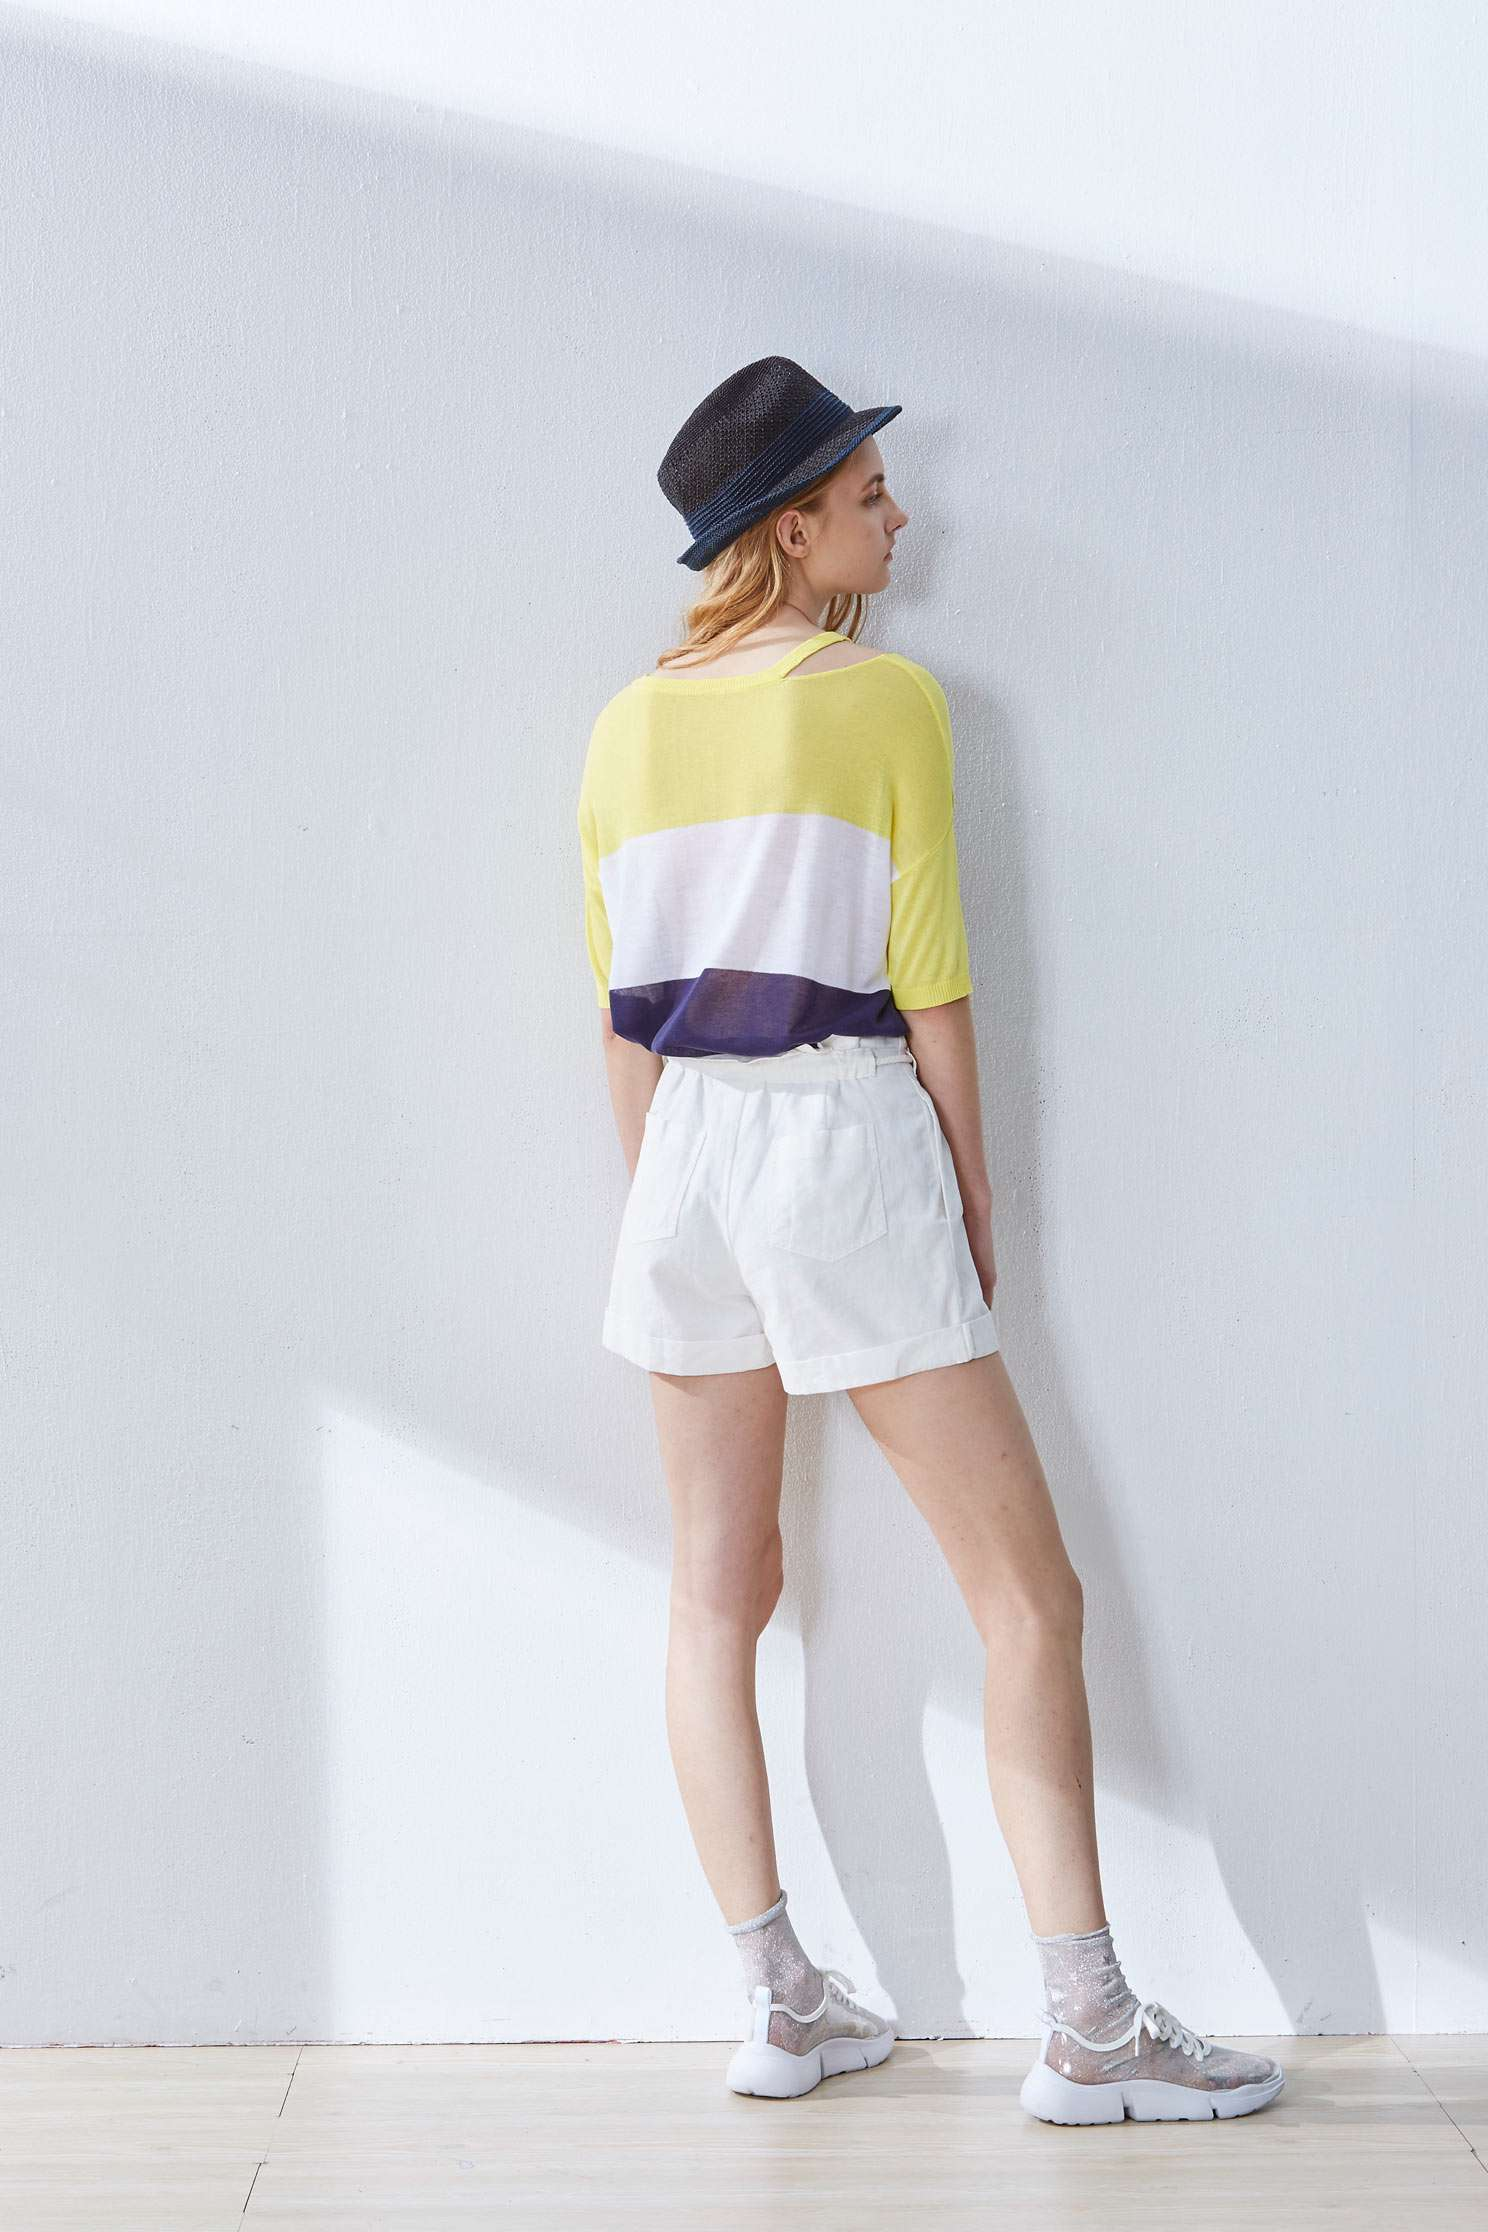 Contrast popular knit top,top,elbowsleevetop,roundnecktop,shortsleevetop,i-select,knitting,knittedtop,knittedtop